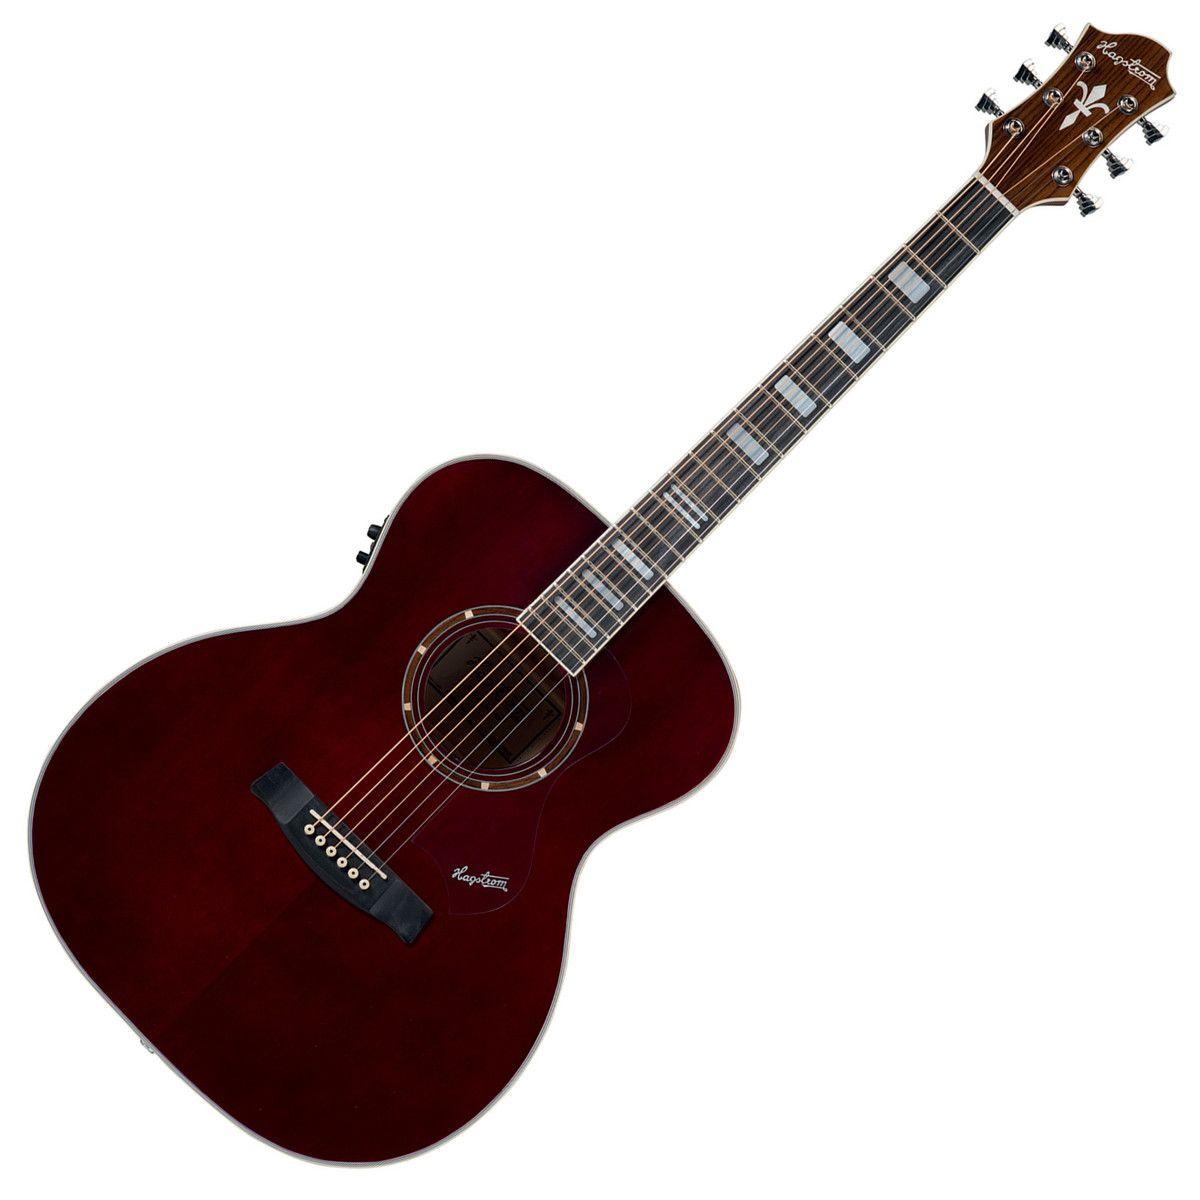 Hagstrom Siljan Custom Guitar, Vogelkirsche Flamme